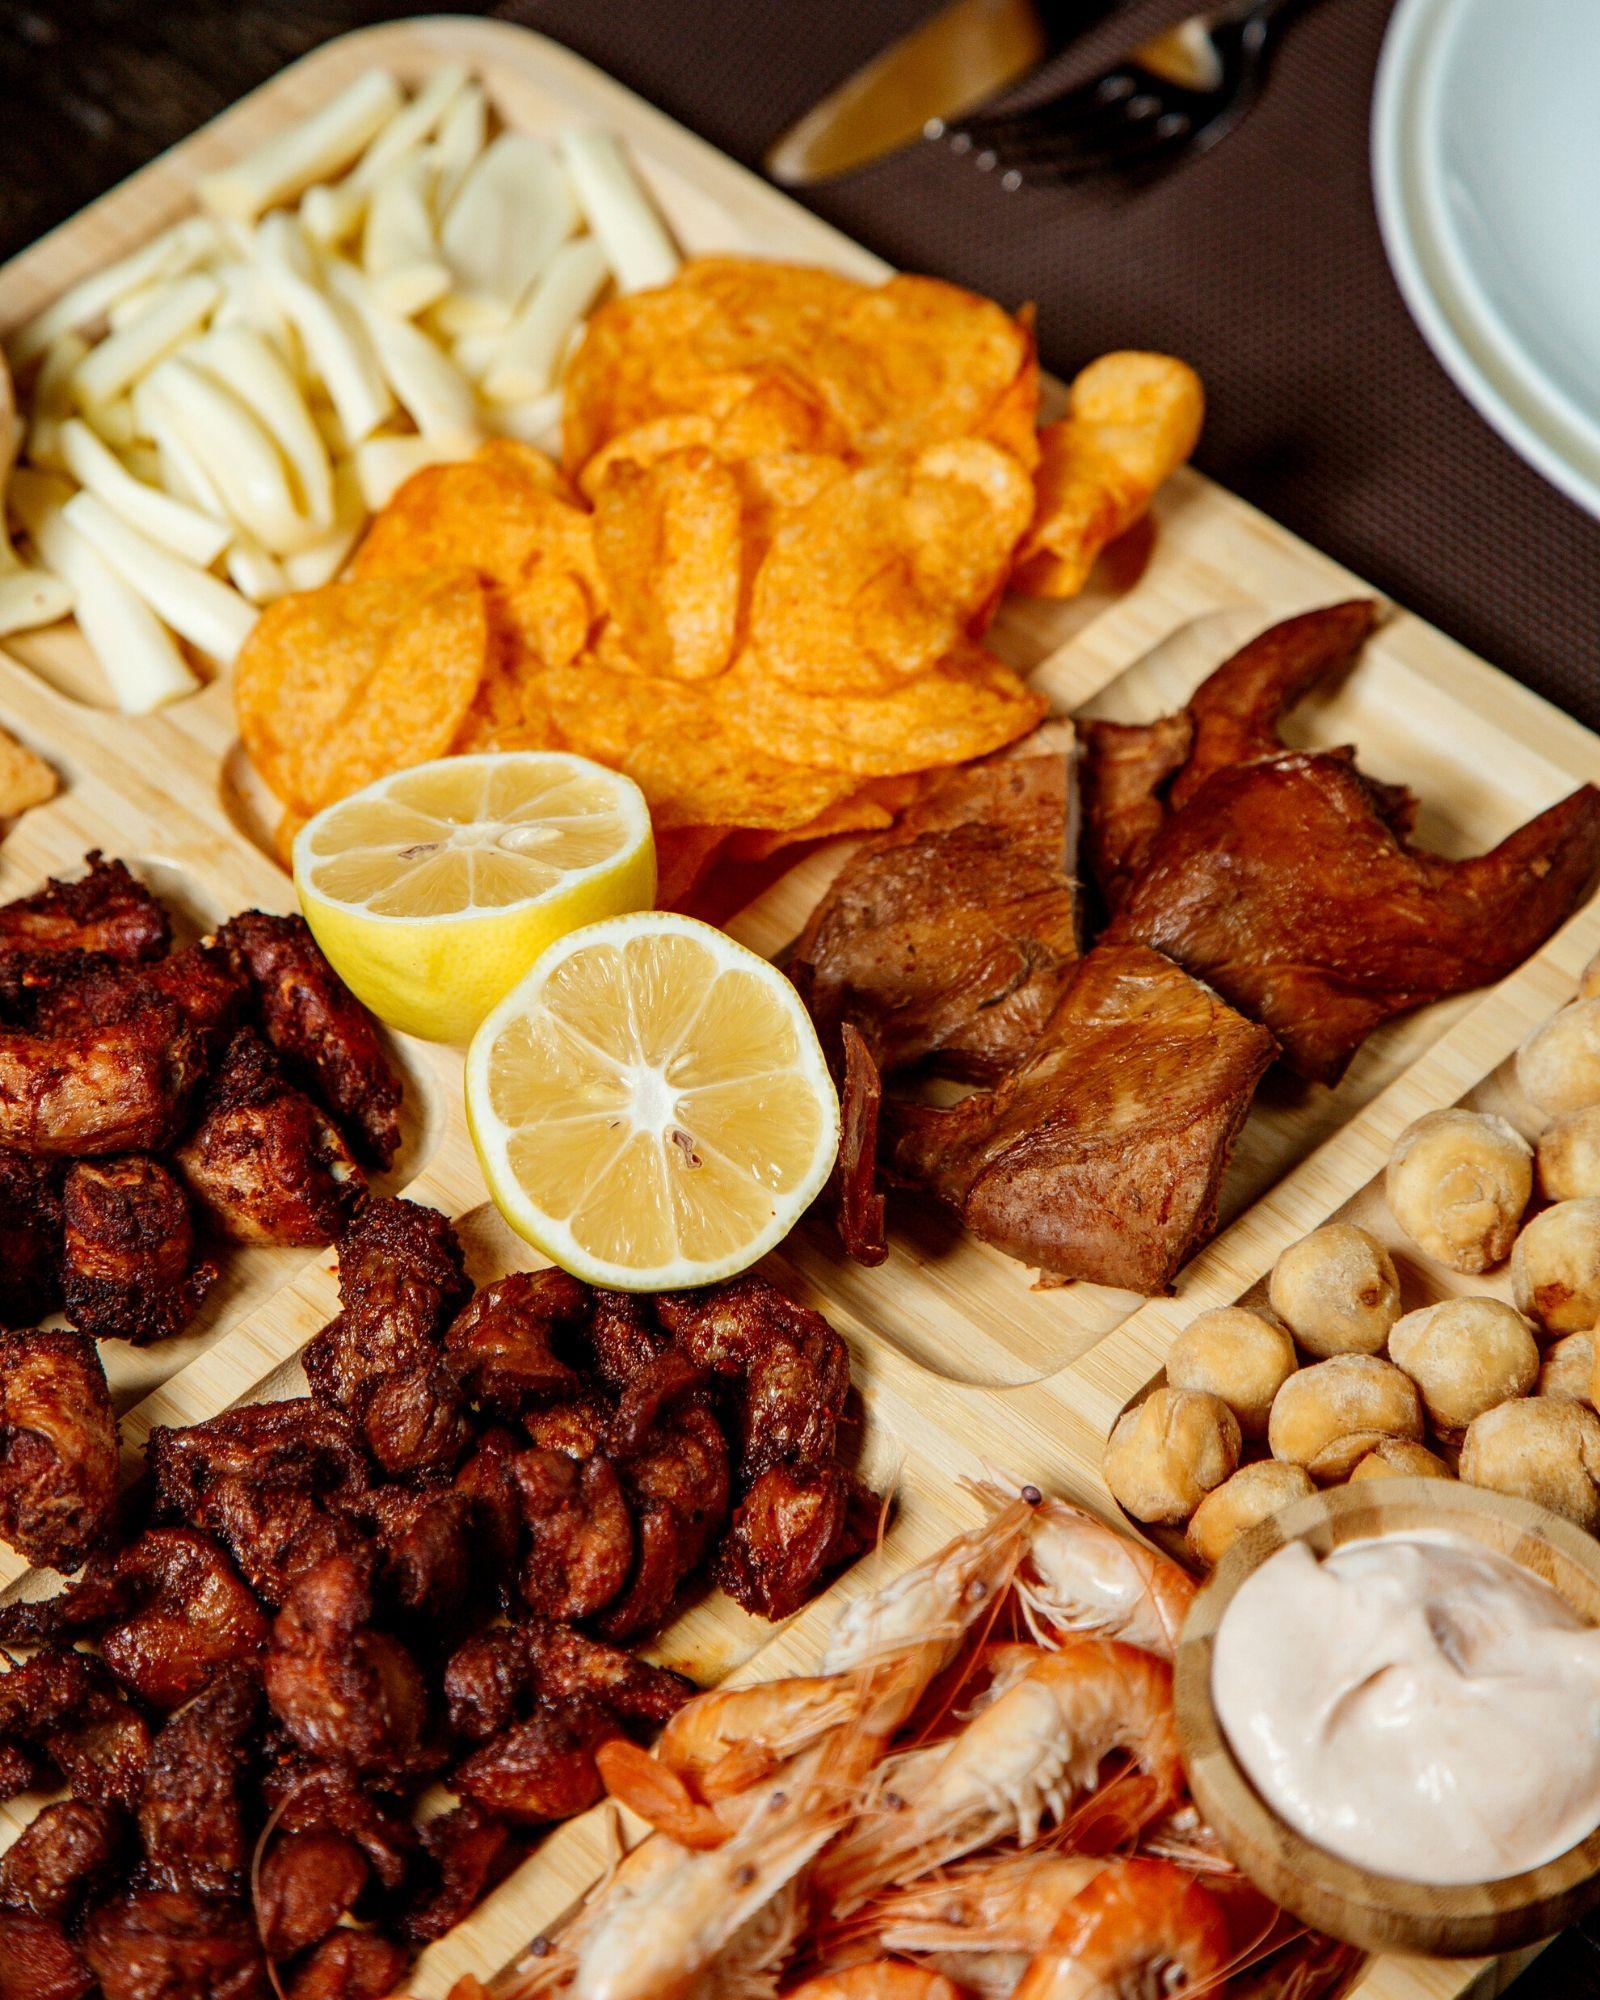 5 petiscos deliciosos para fazer na fritadeira elétrica